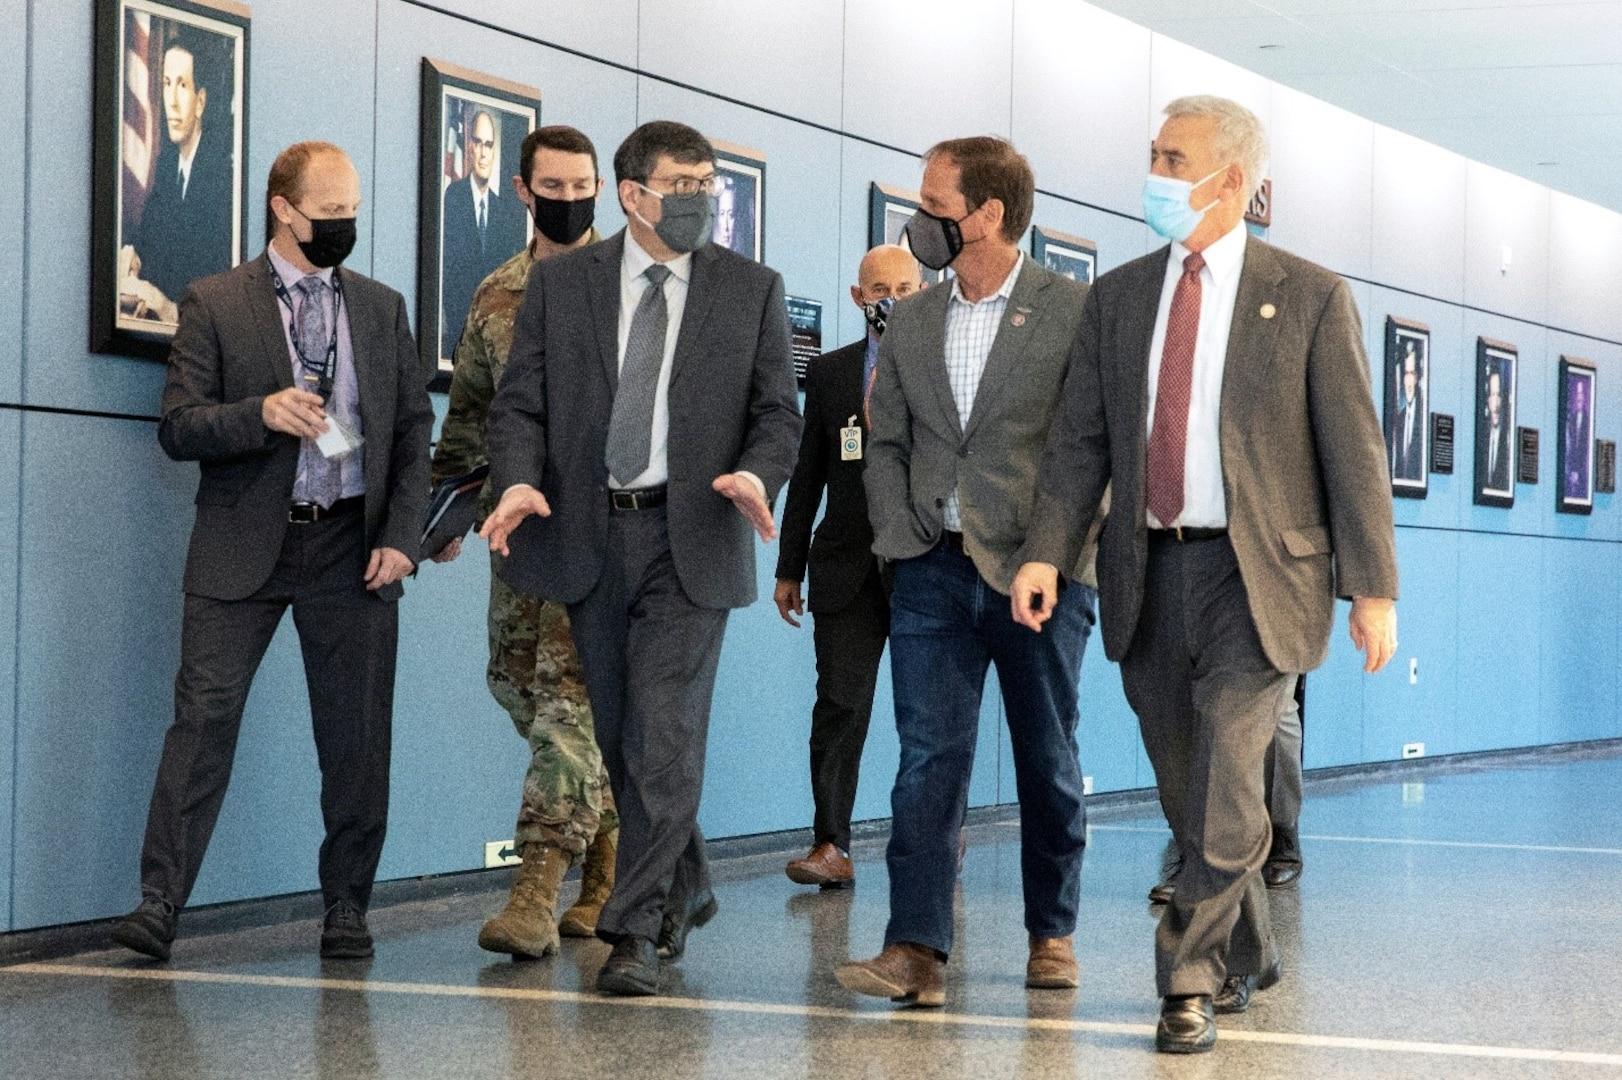 HPSCI representatives visit Westfields